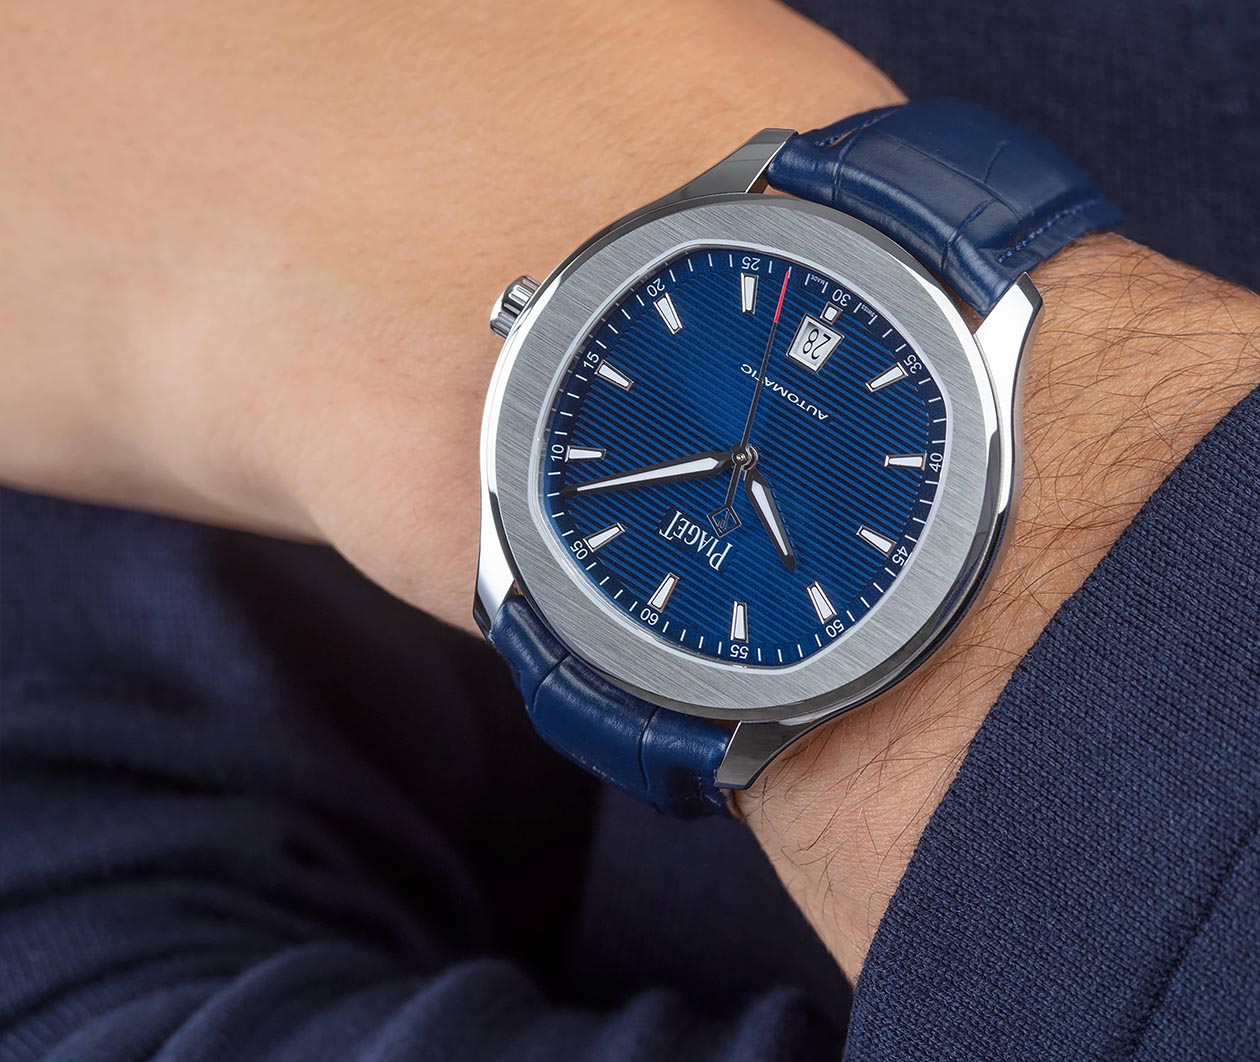 Piaget Polo watch G0A43001 Carousel 2 FINAL